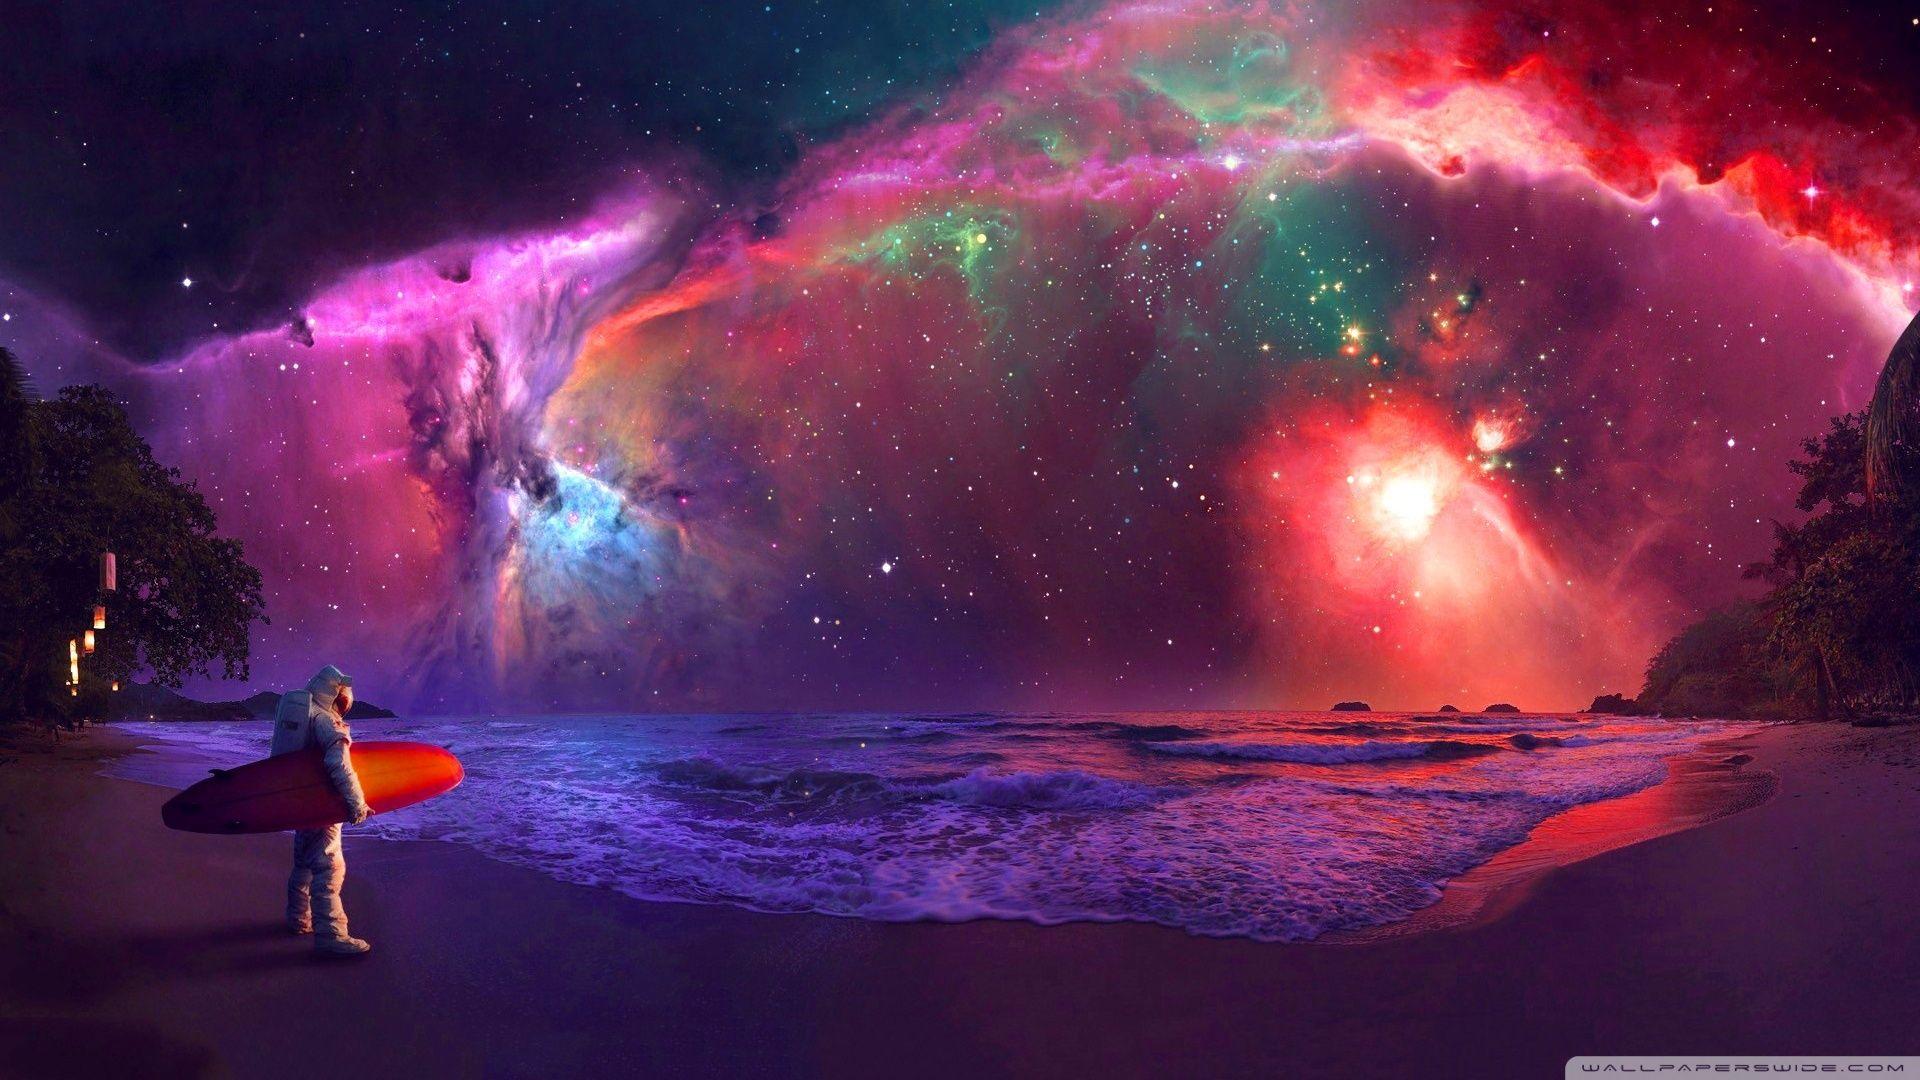 Astronaut Galaxy Wallpapers   Top Astronaut Galaxy 1920x1080